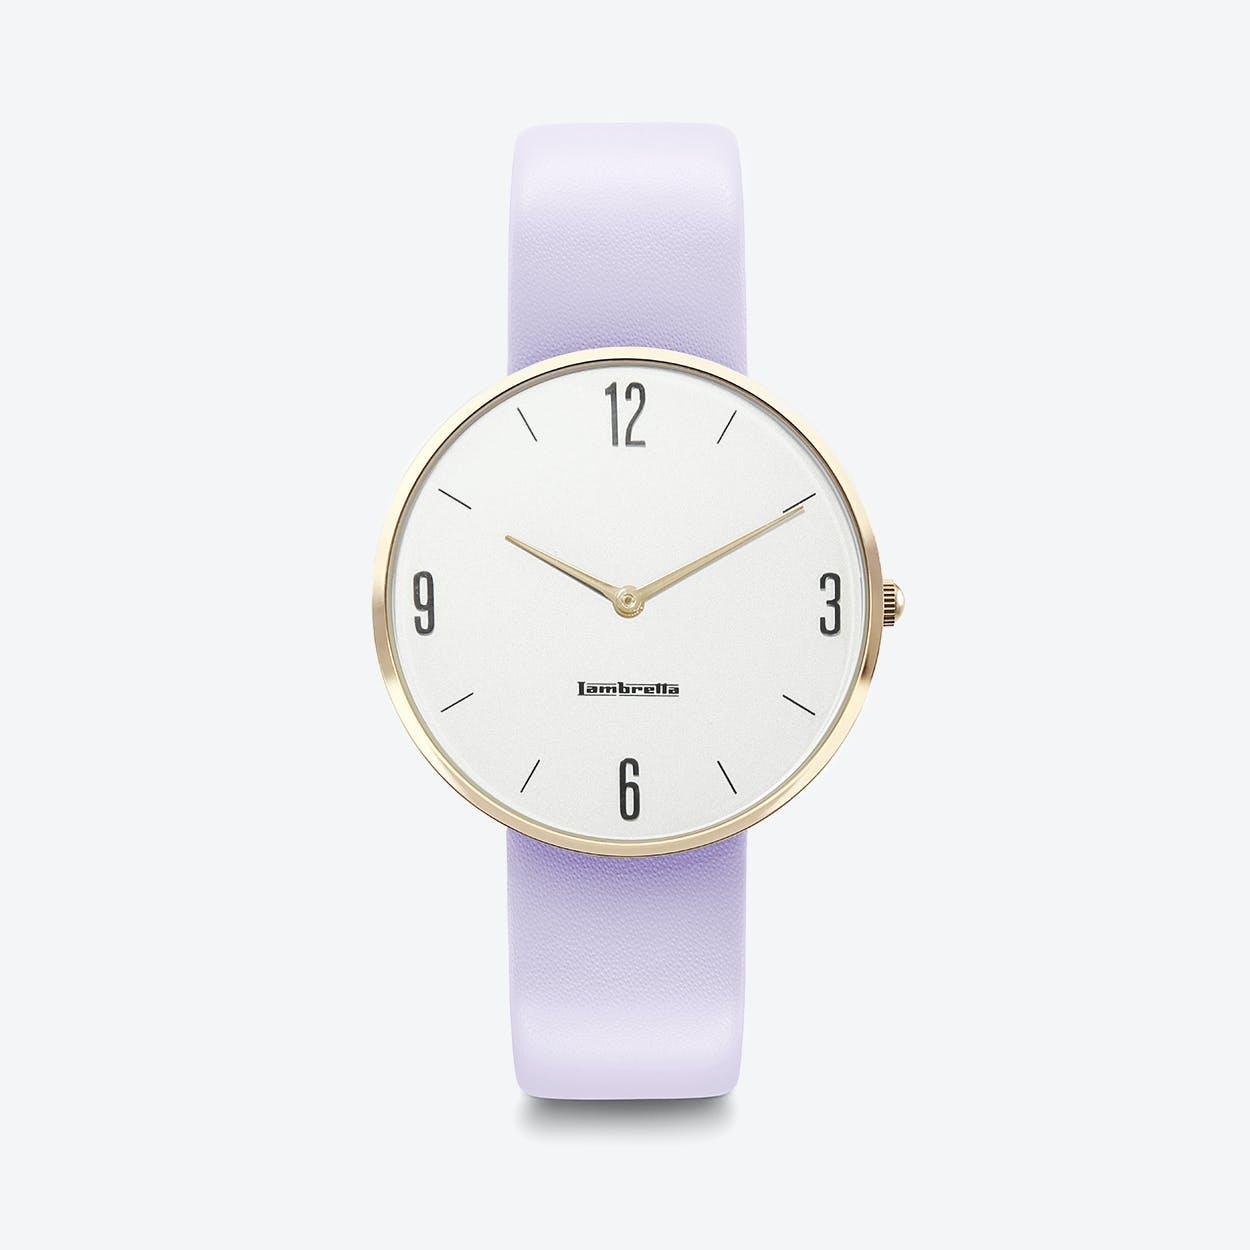 Numero 34 Watch in Gold w/ Purple Leather Strap & White Face